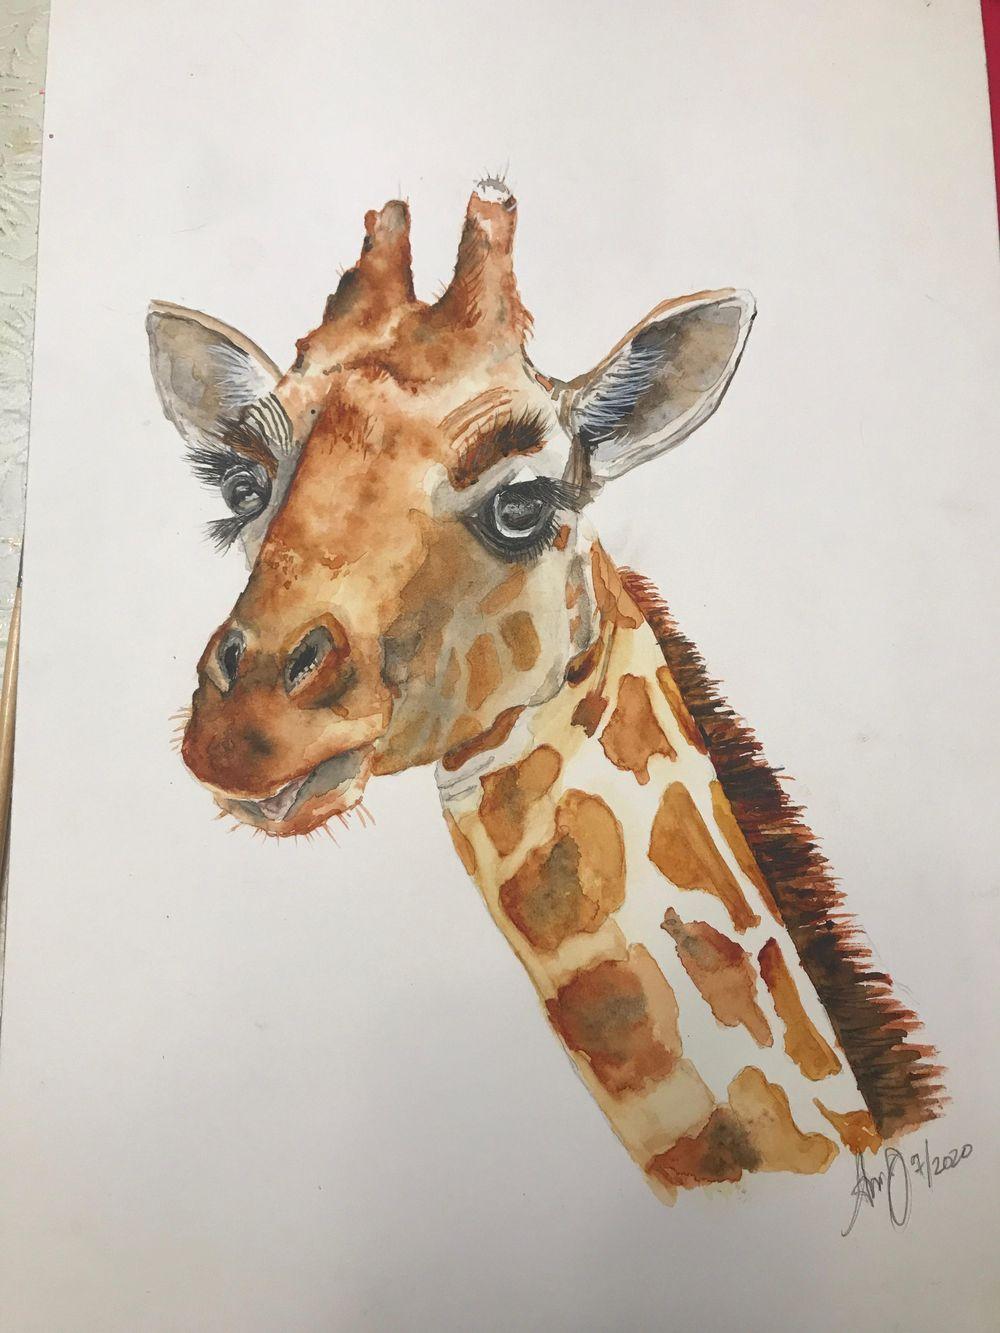 wc giraffe 1 & 2 - image 1 - student project